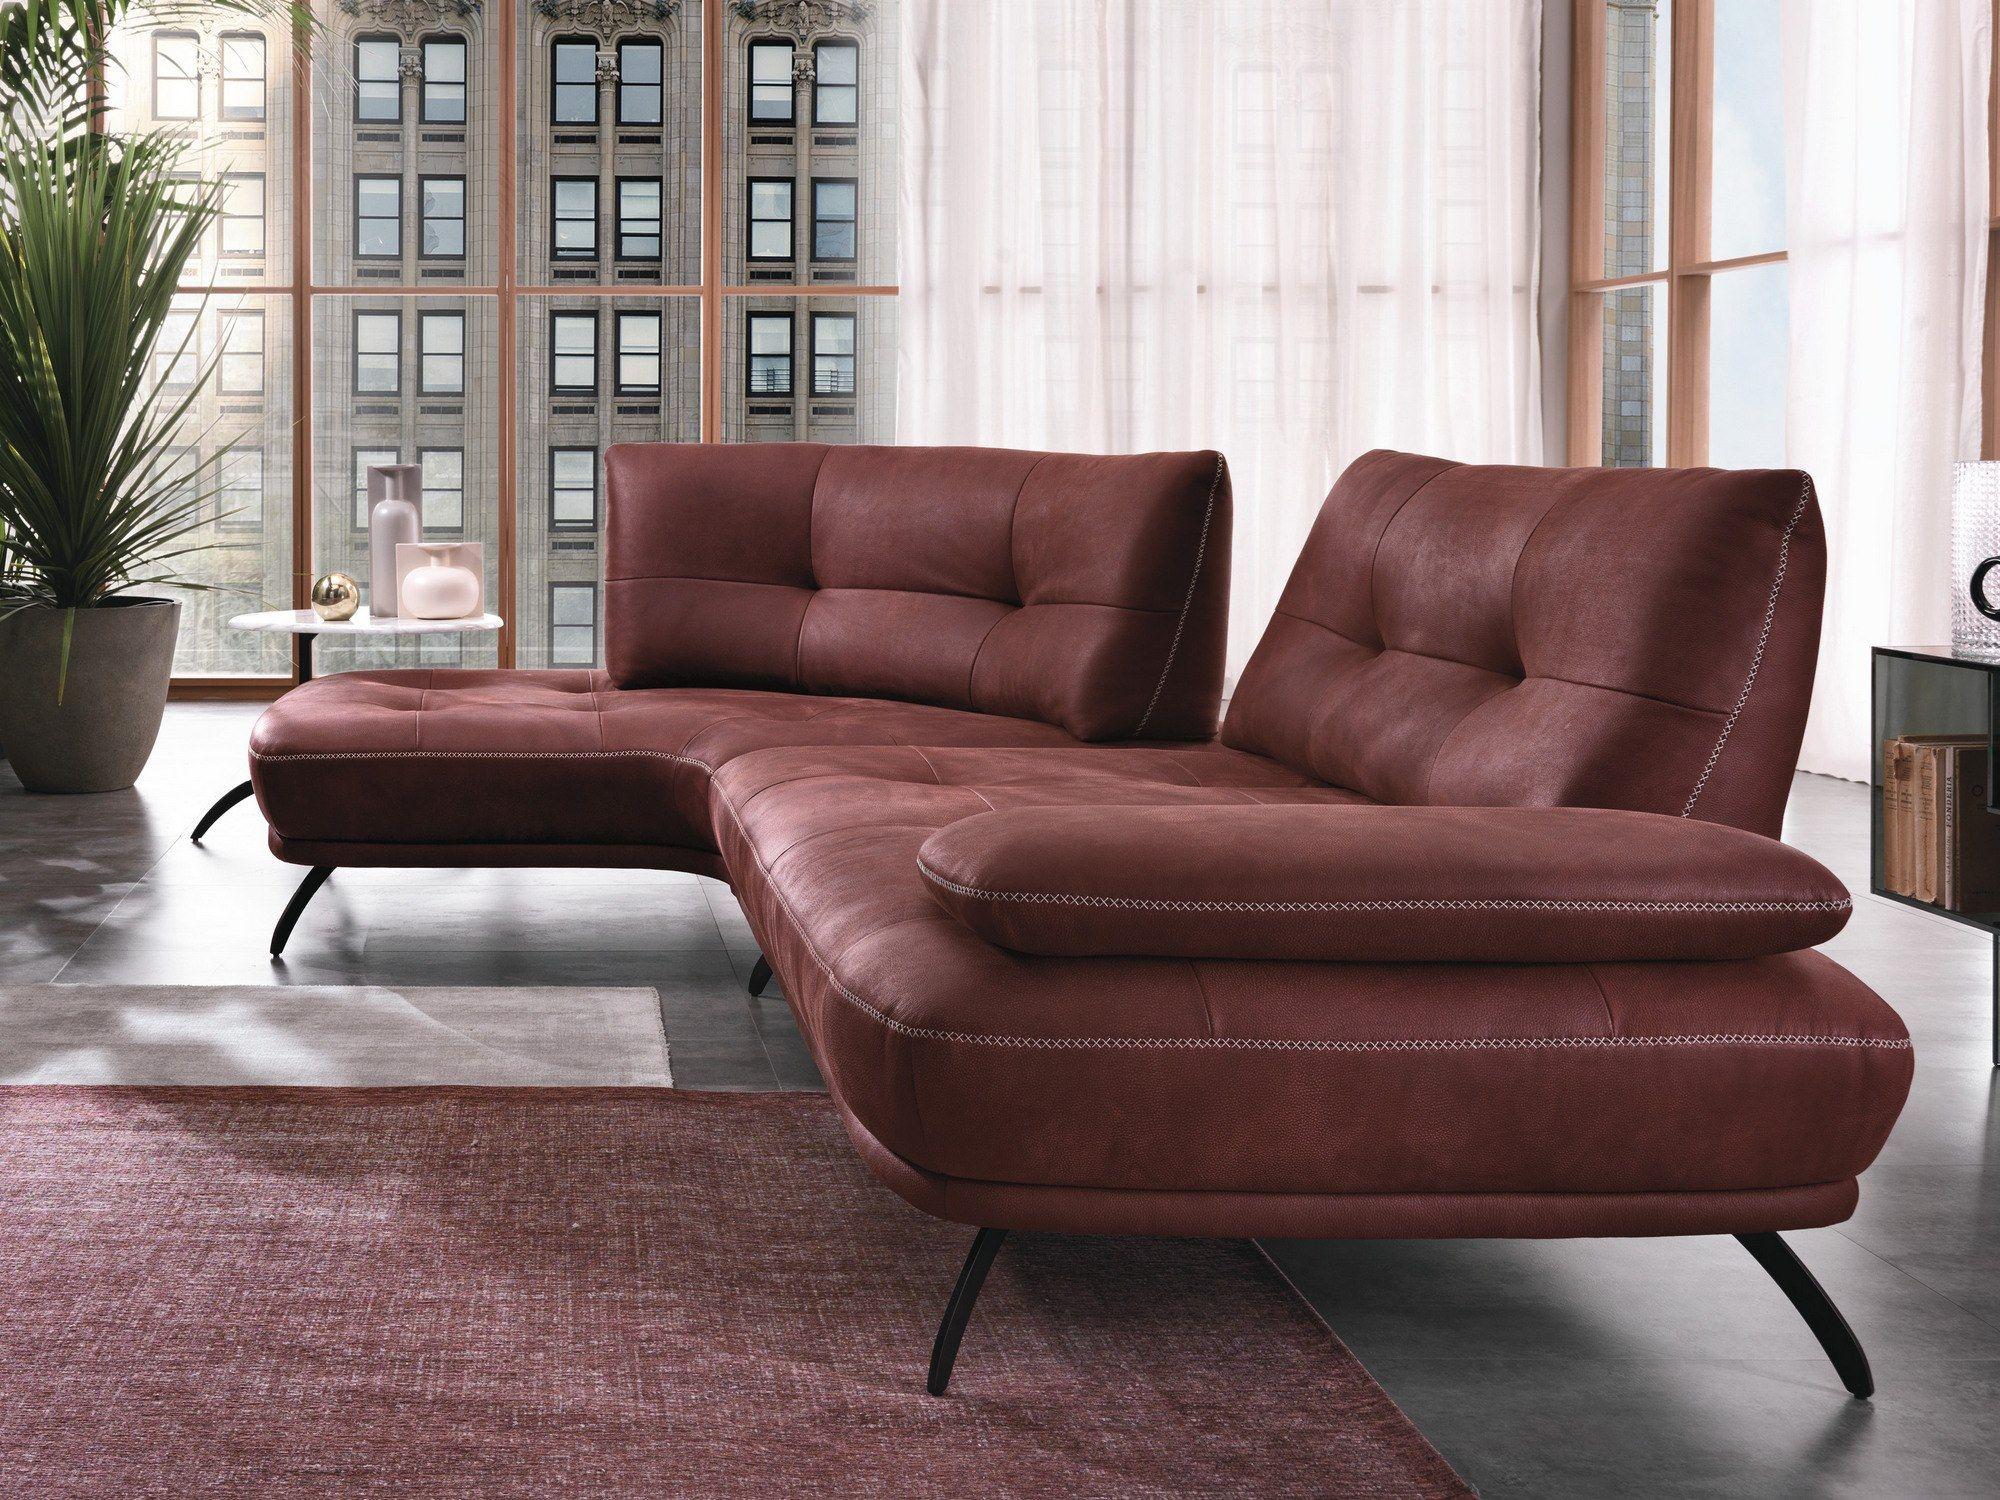 Corner sectional fabric sofa bogart by max divani 2020 솜휜